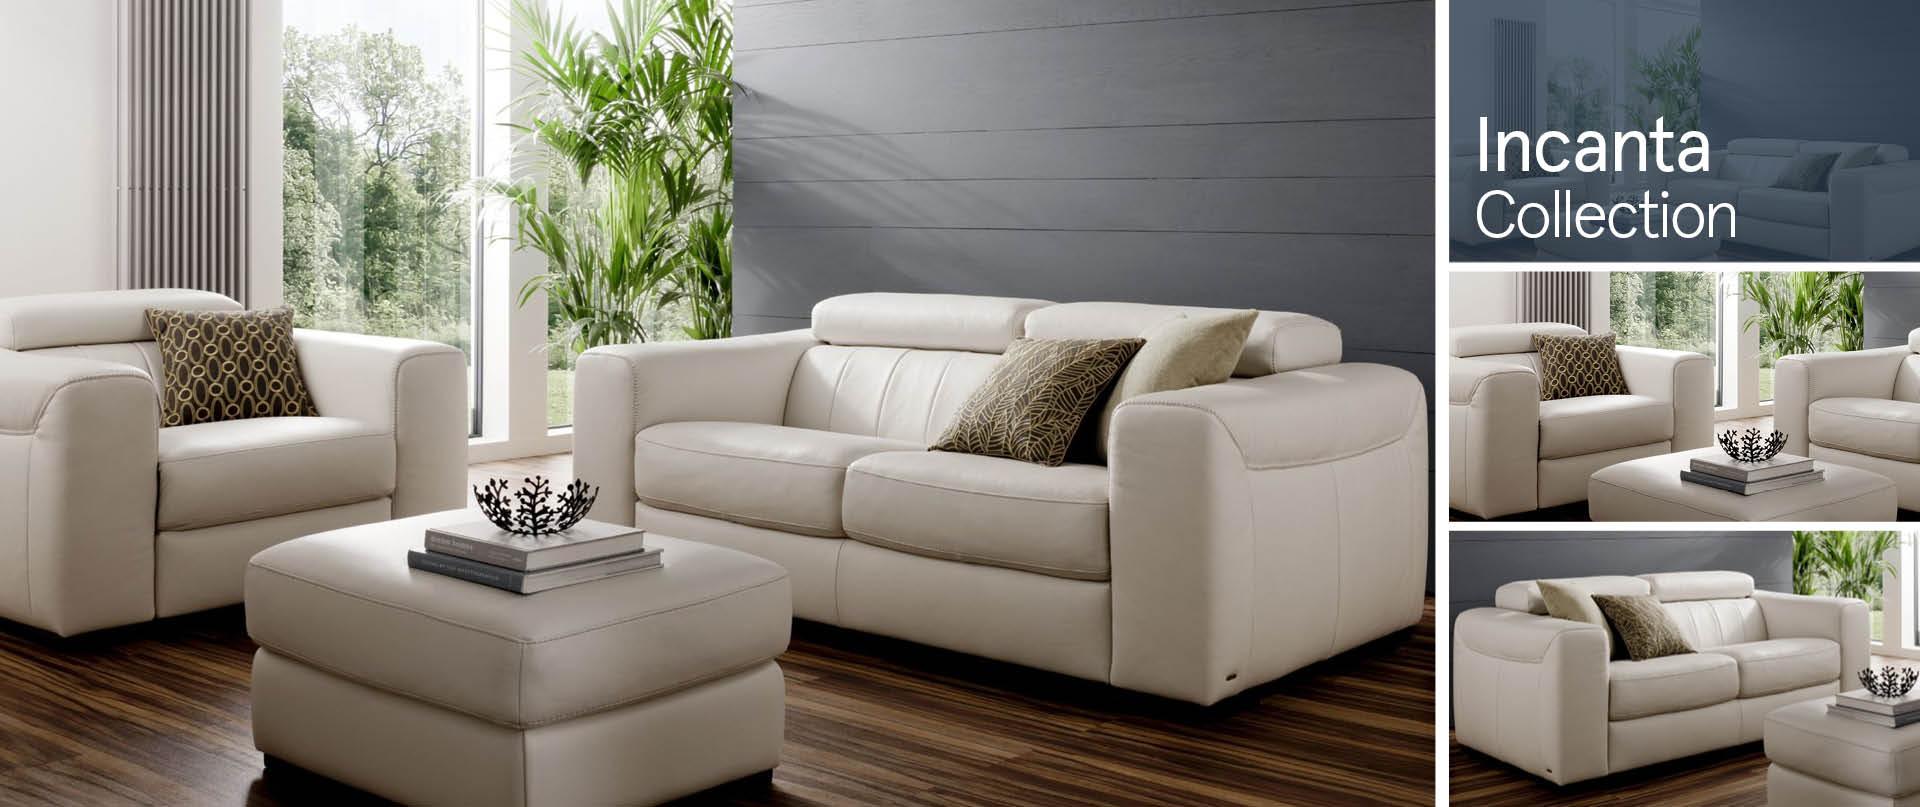 Incanta Leather Sofa Ranges